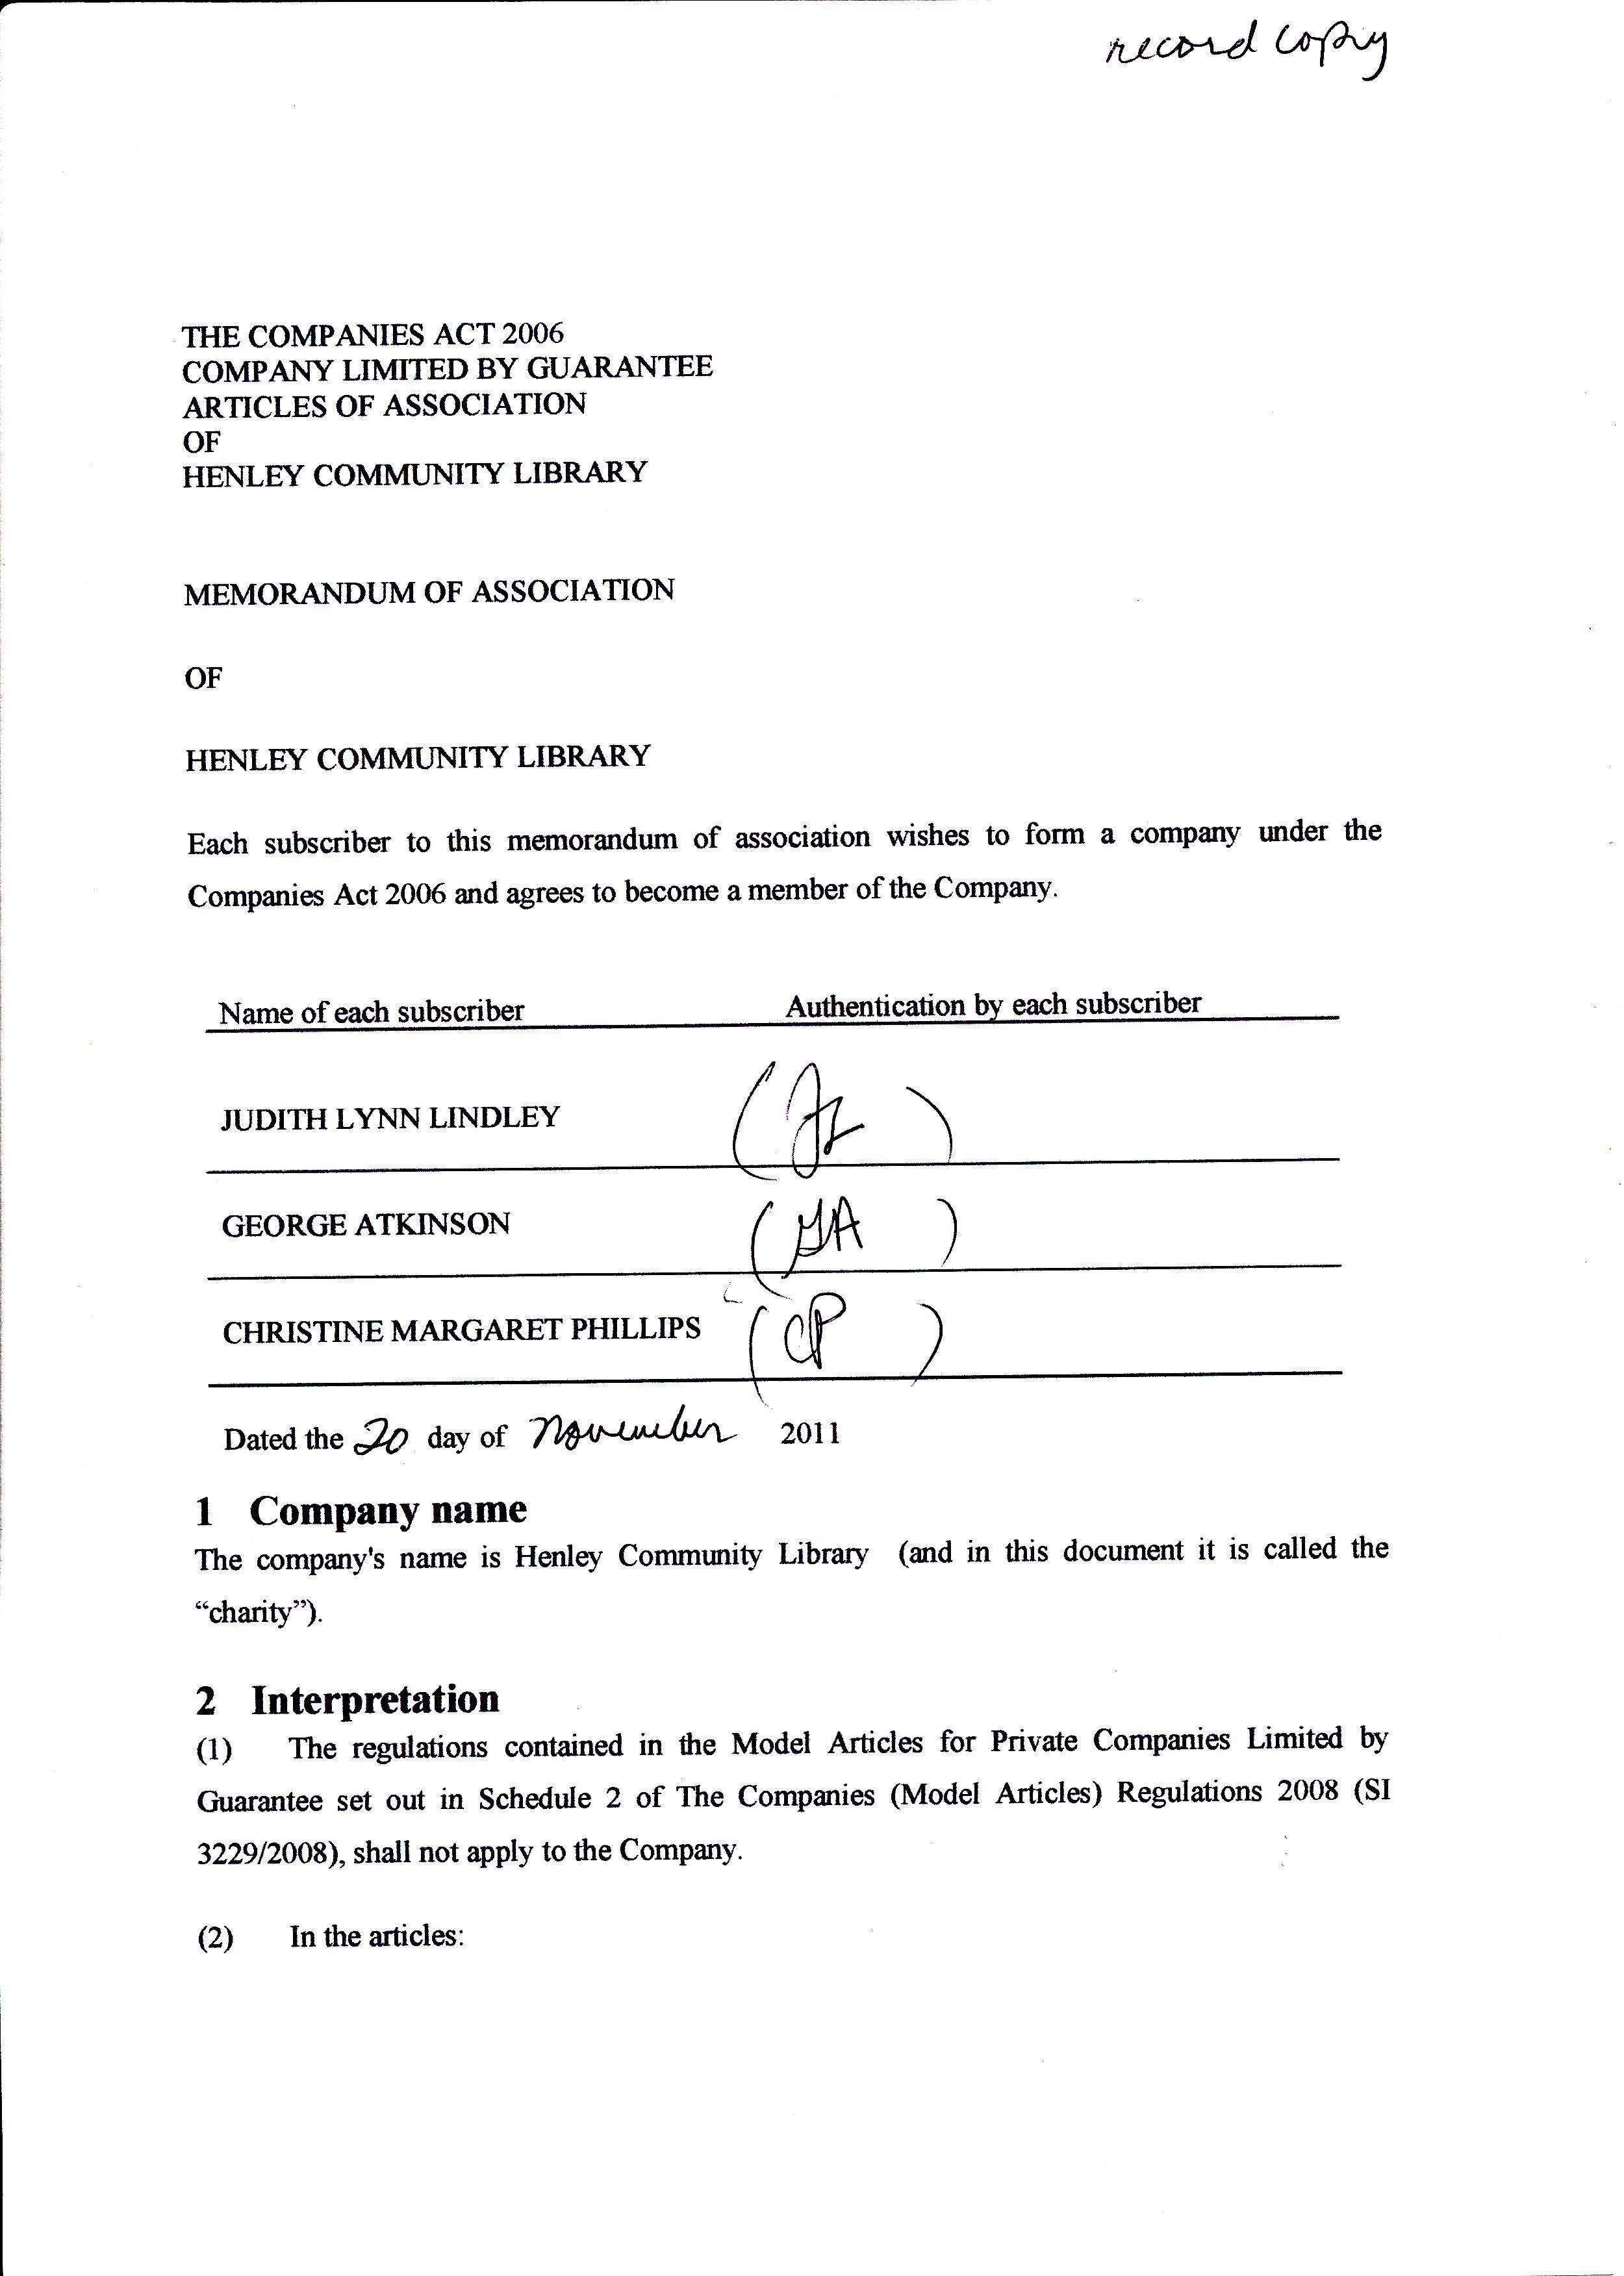 Community Grants – Memorandum Of Association